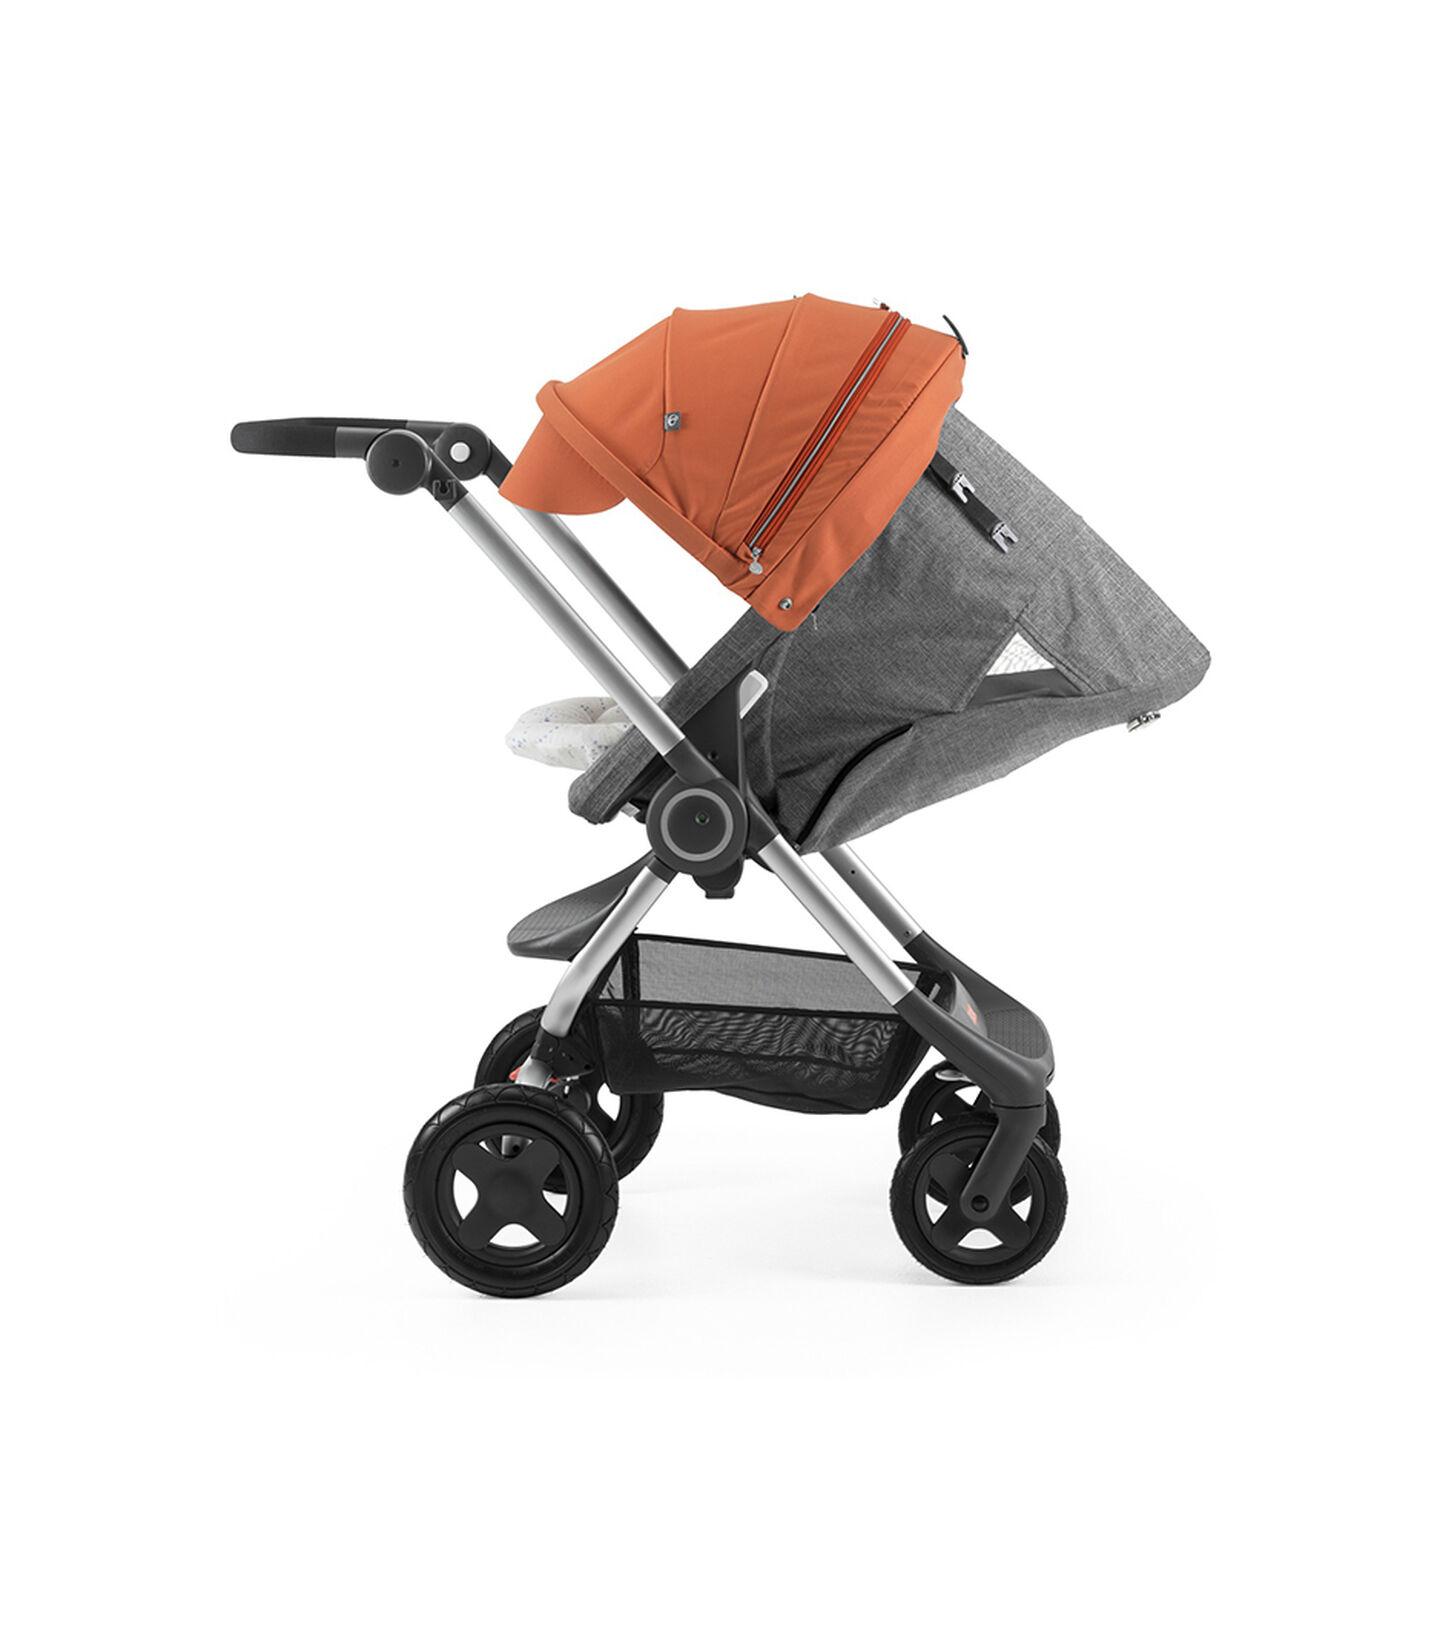 Stokke® Scoot™ with Black Melange seat and Orange Canopy. Parent Facing. Sleep position.